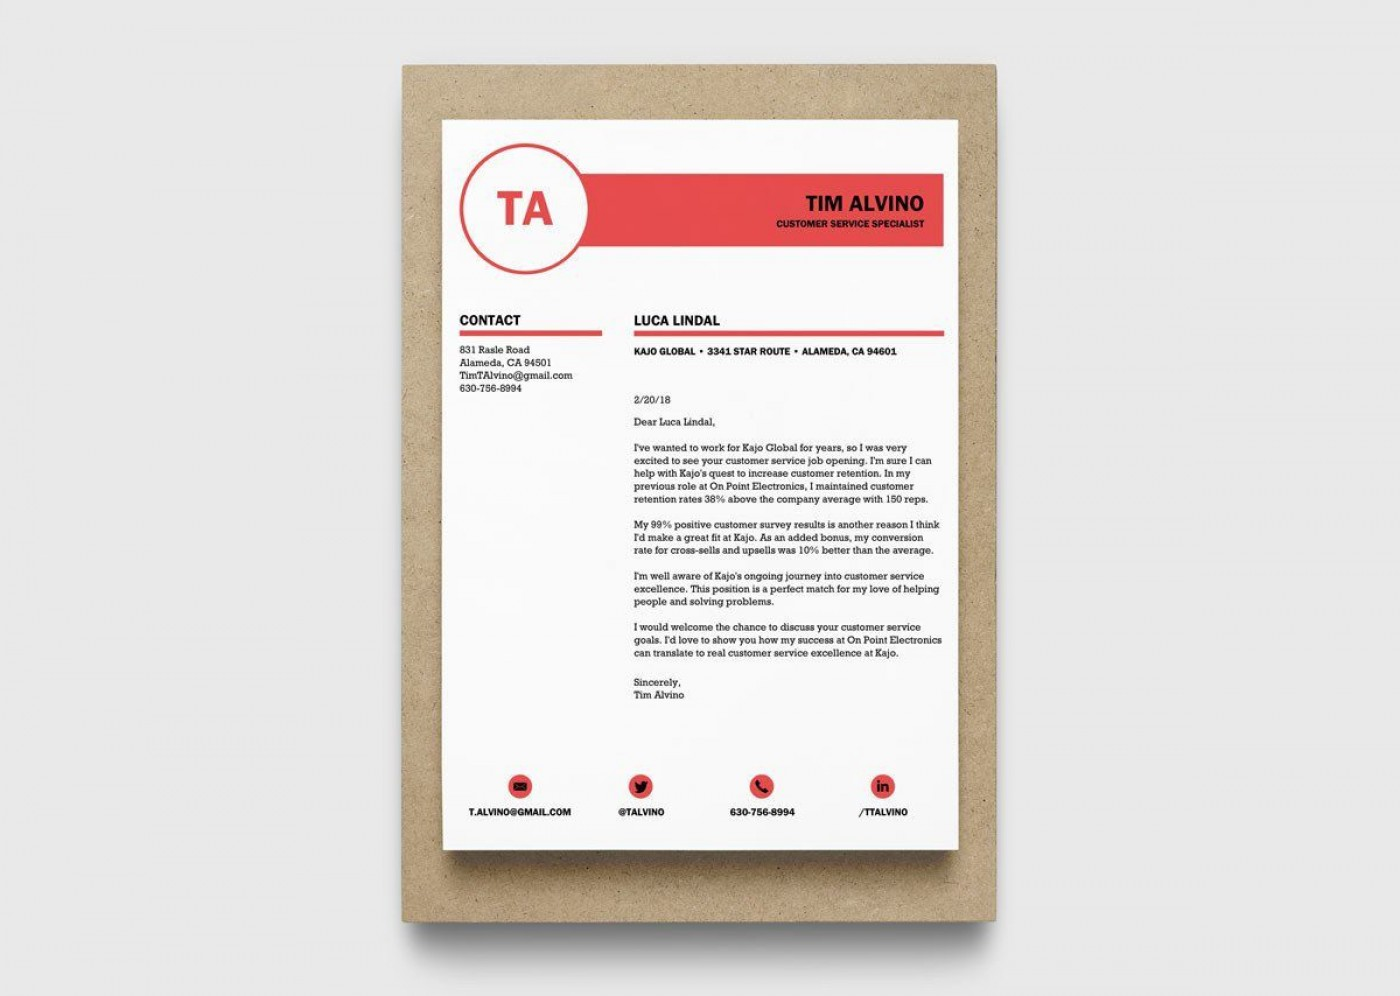 005 Wondrou Resume Cover Letter Template Microsoft Word Design 1400